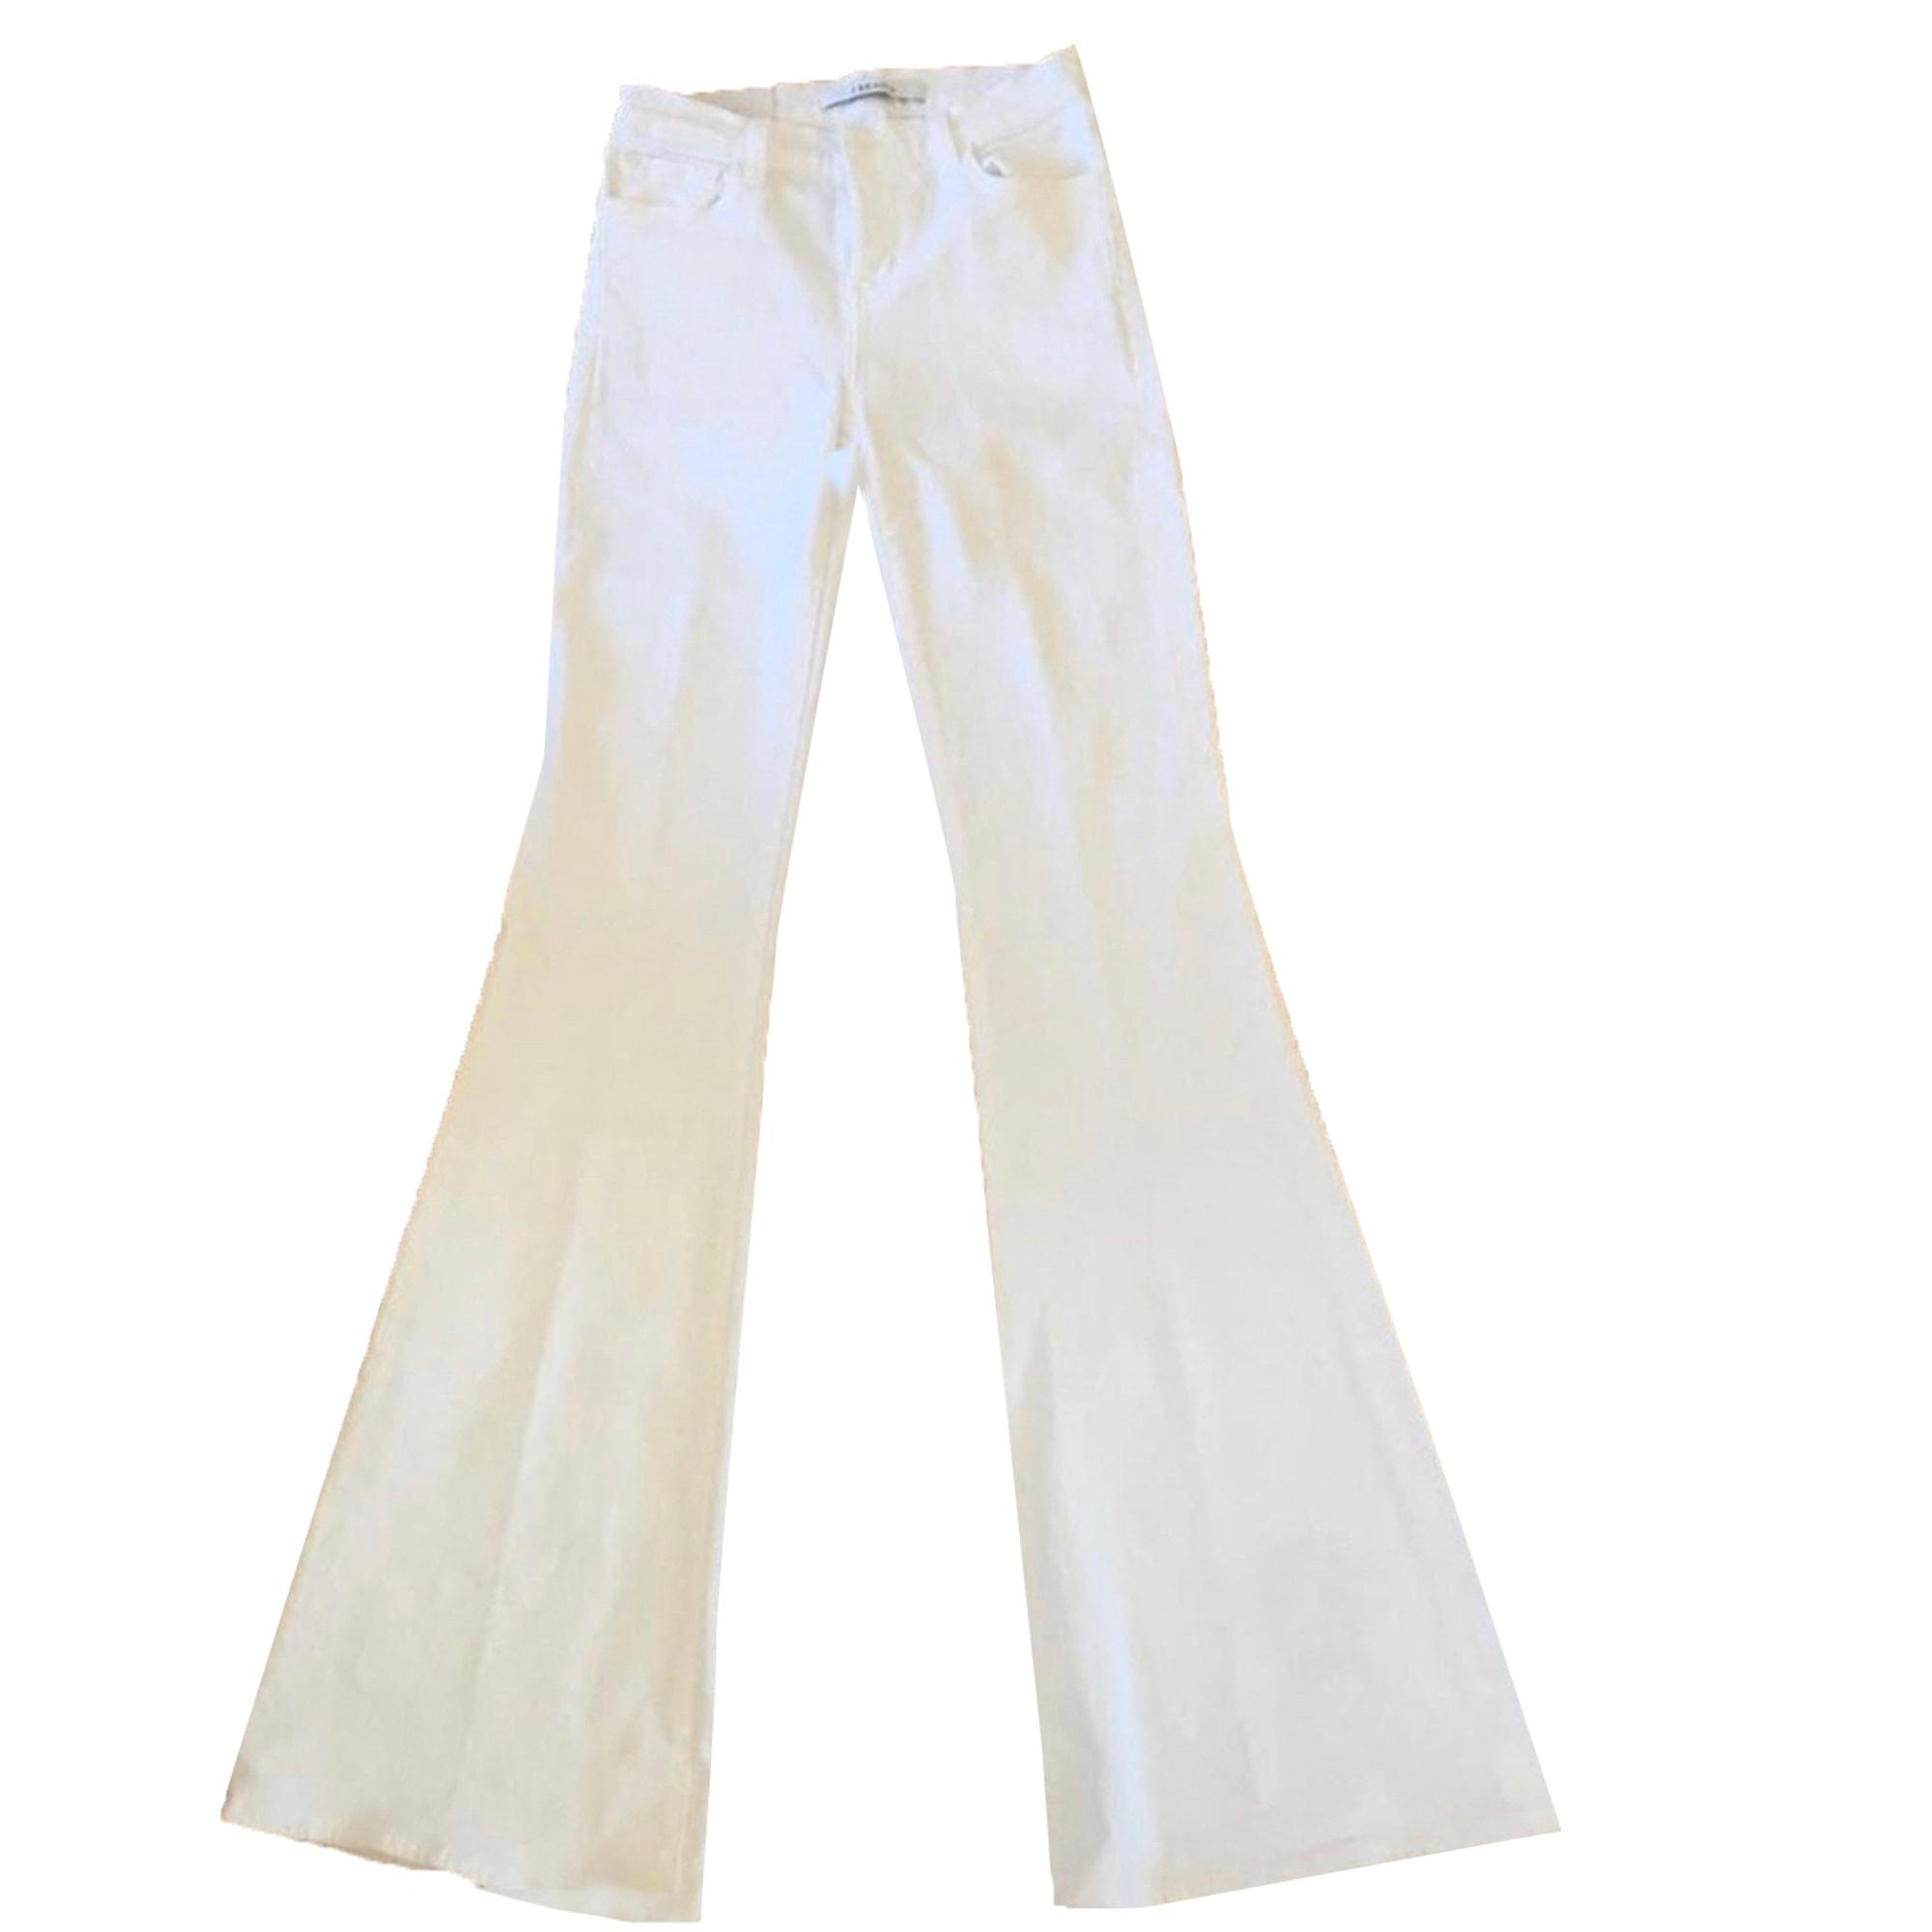 Jeans évasé, boot-cut J BRAND Blanc, blanc cassé, écru